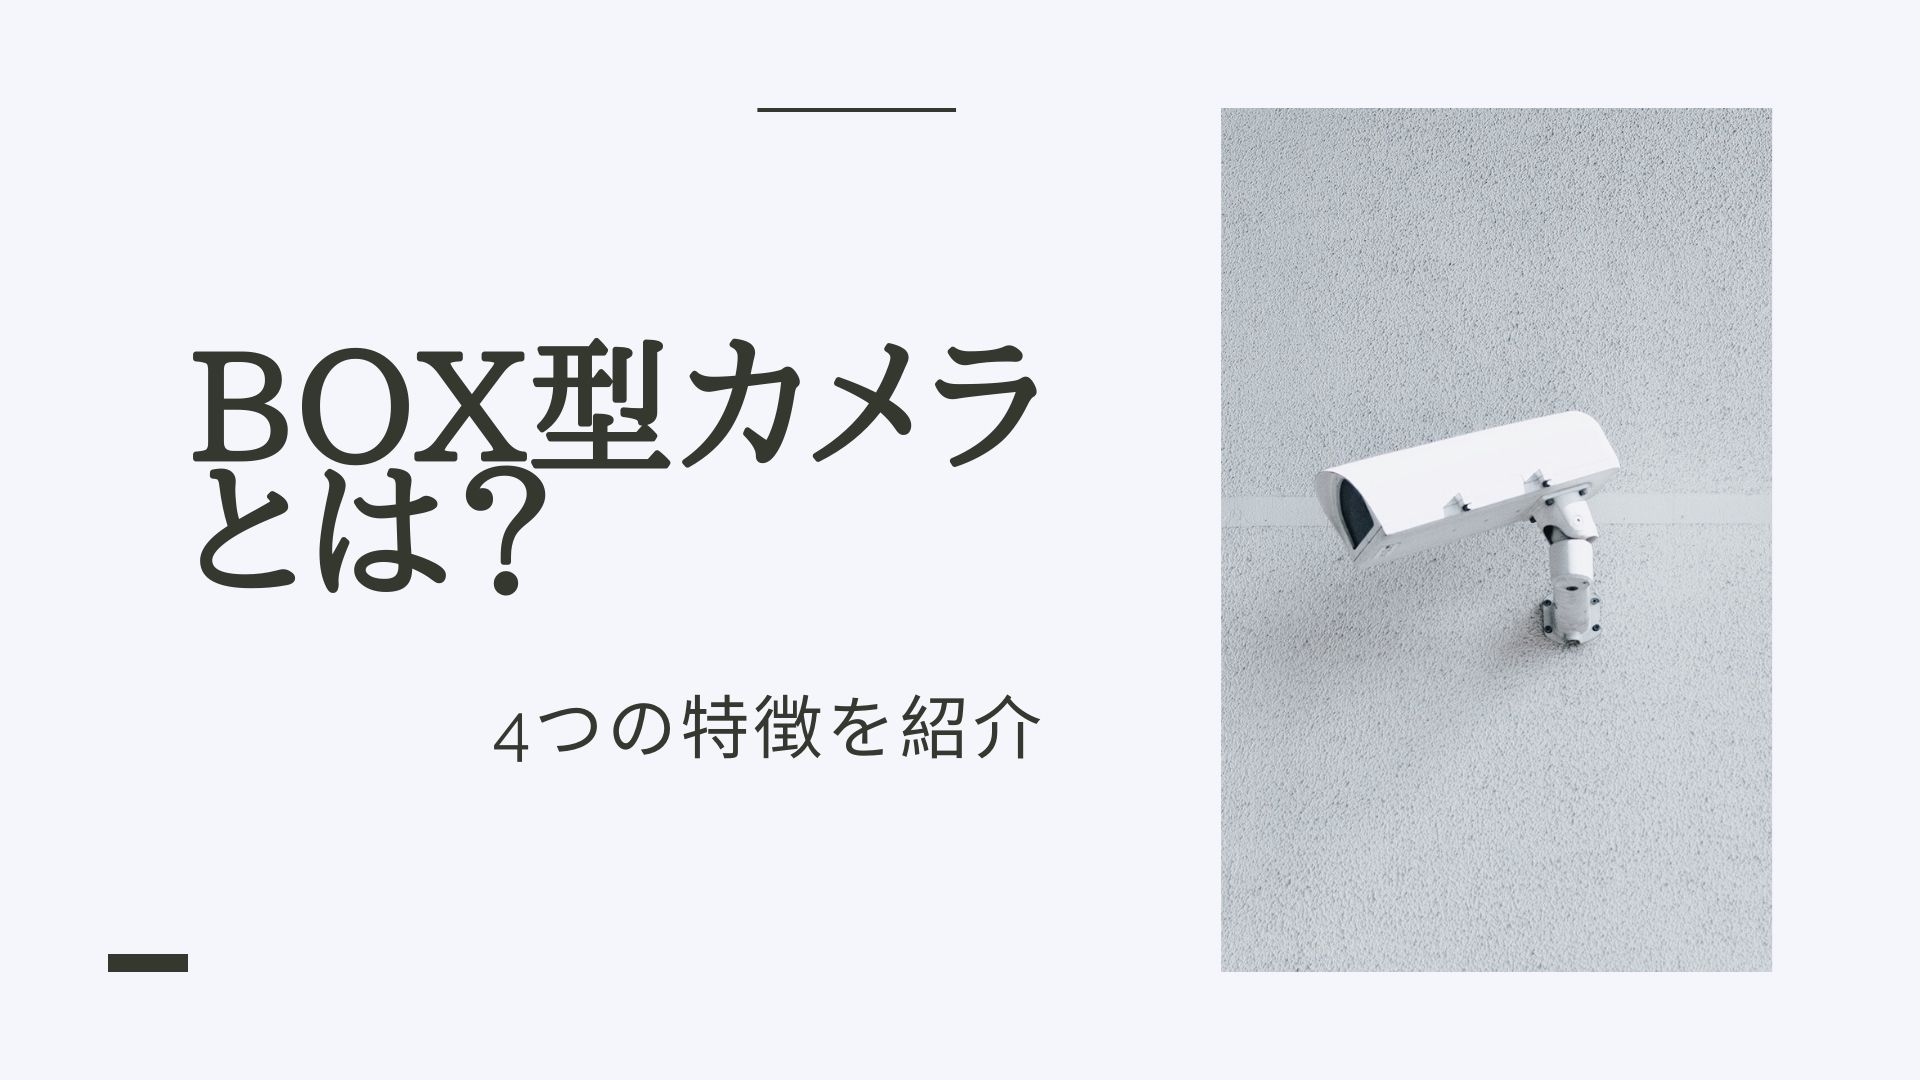 BOX型カメラとは?4つの特徴を紹介